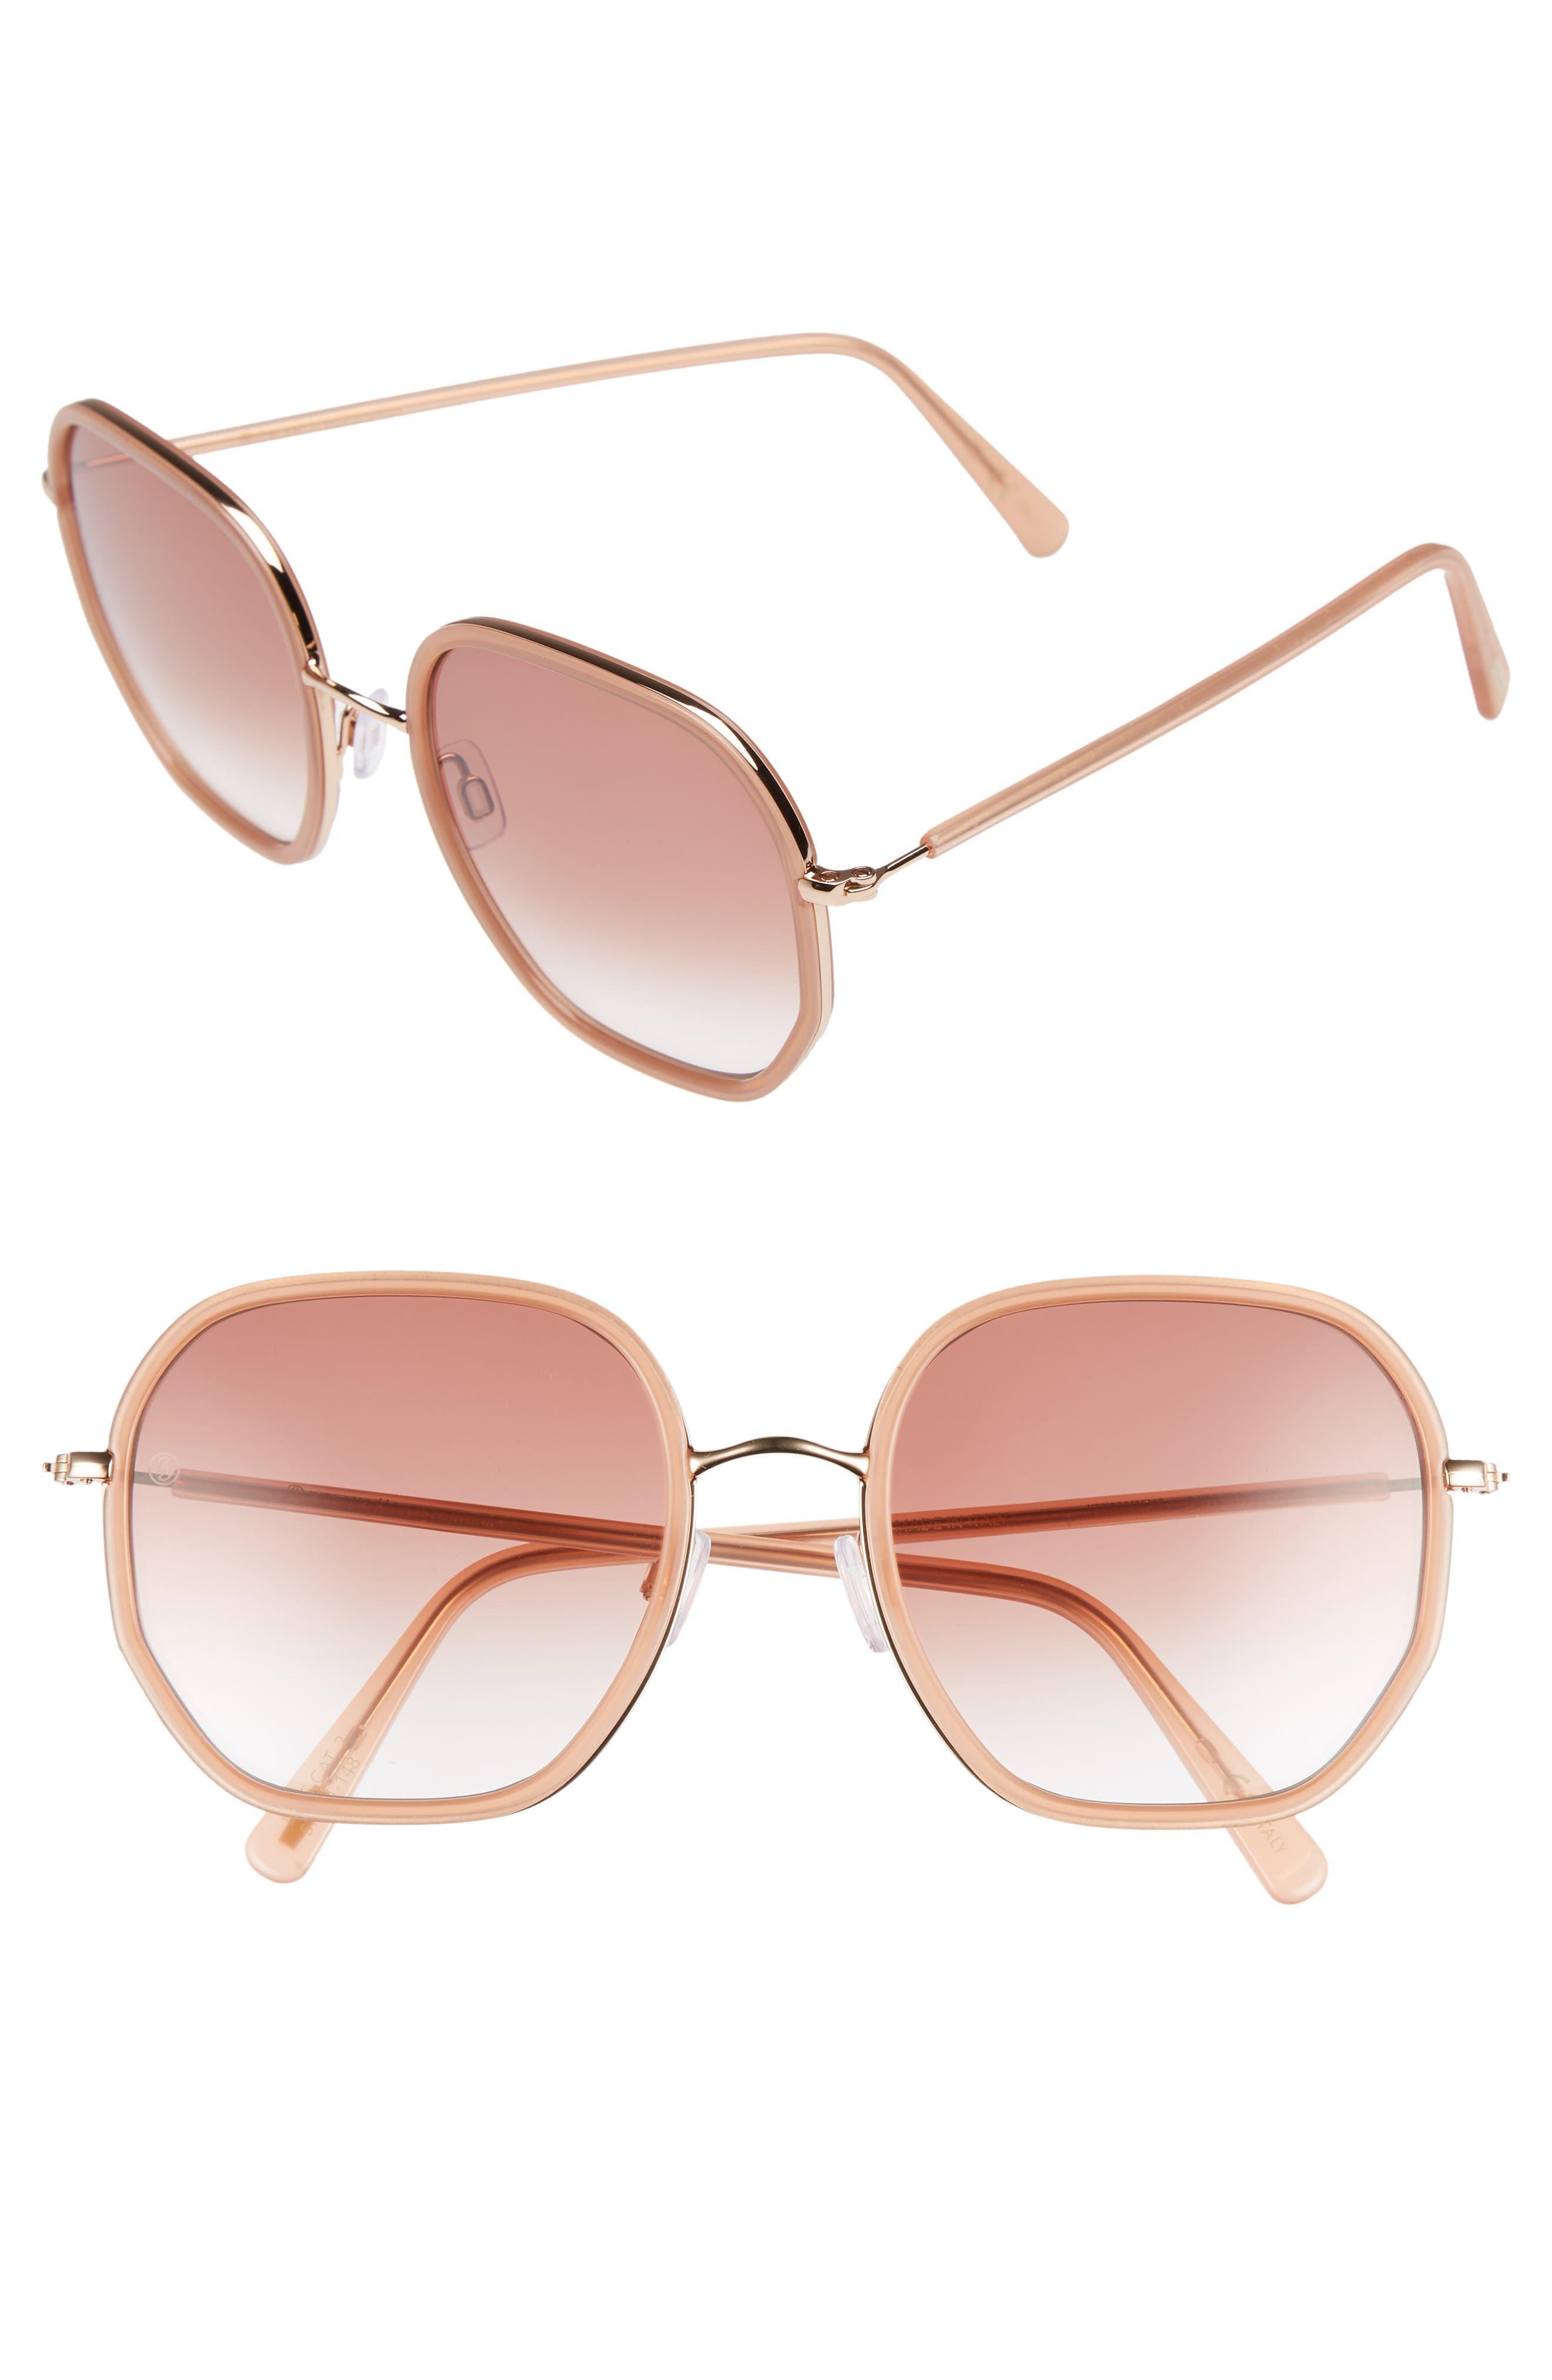 D'BLANC Rare Fortune 57mm Sunglasses,                             Main thumbnail 1, color,                             650